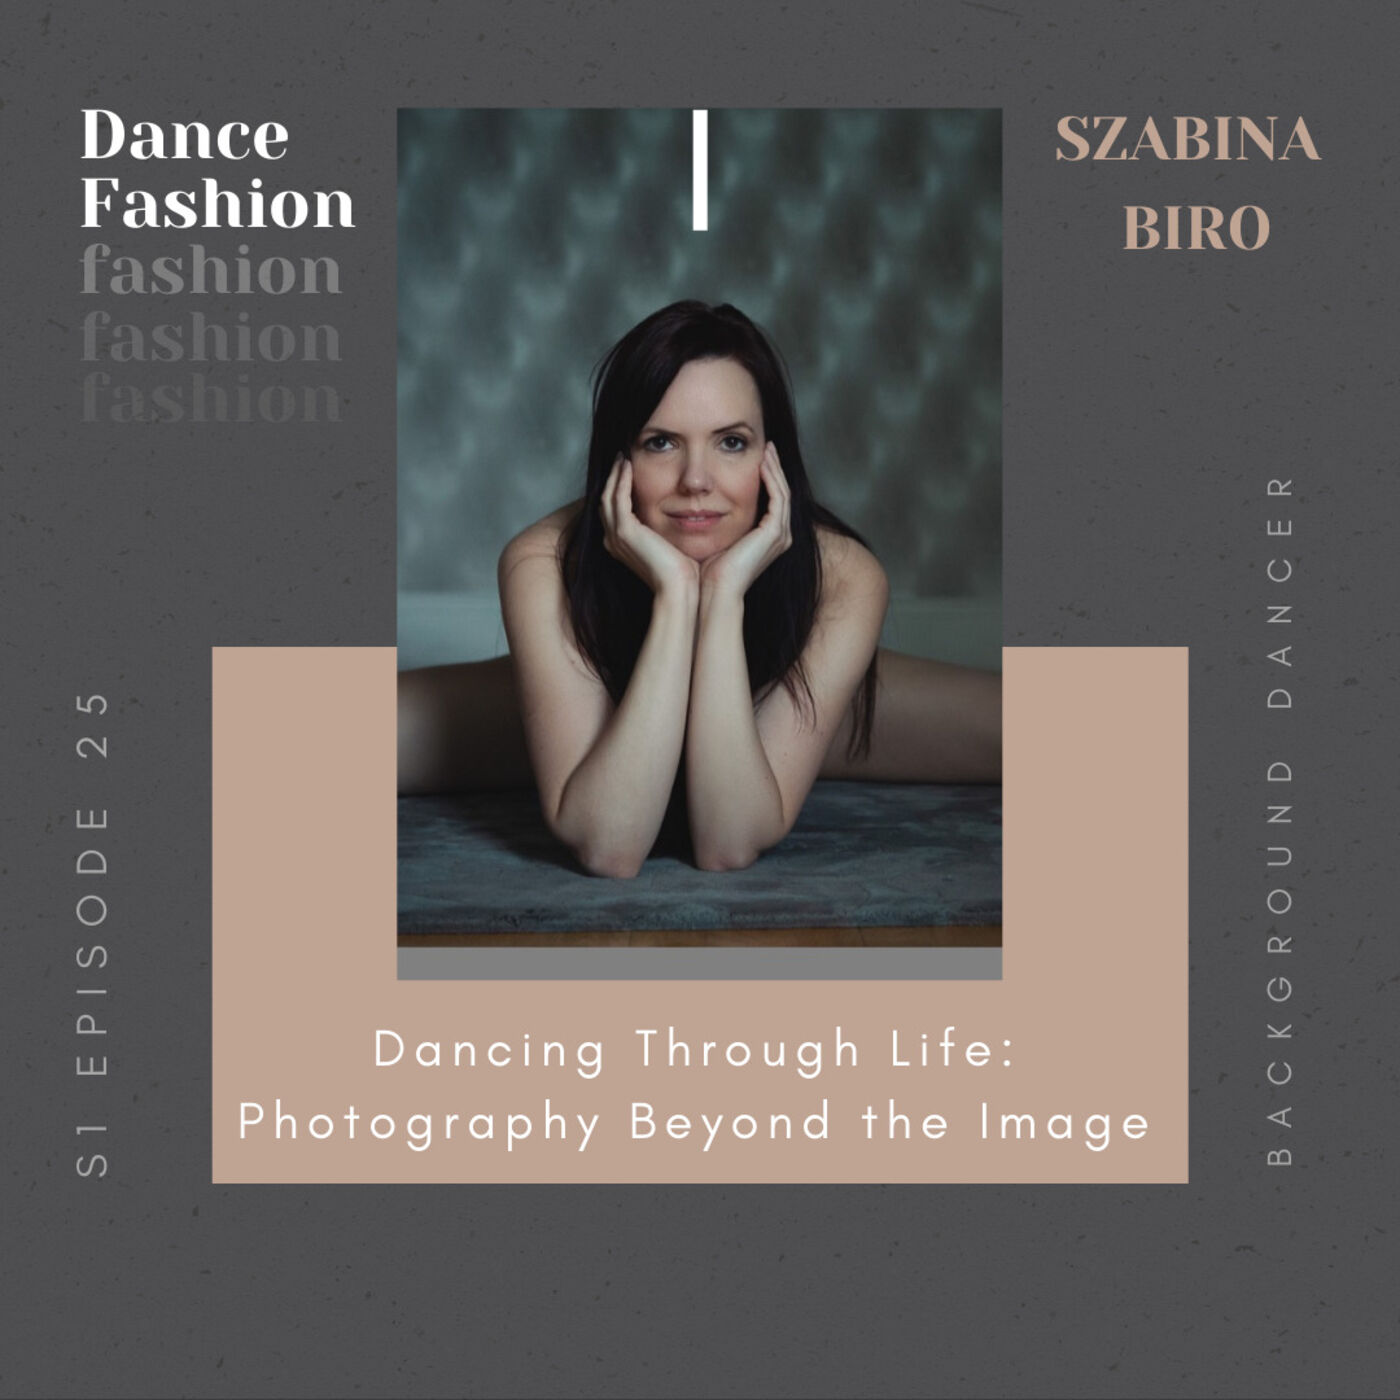 Dancing Through Life: Photography Beyond the Image   Szabina Biro